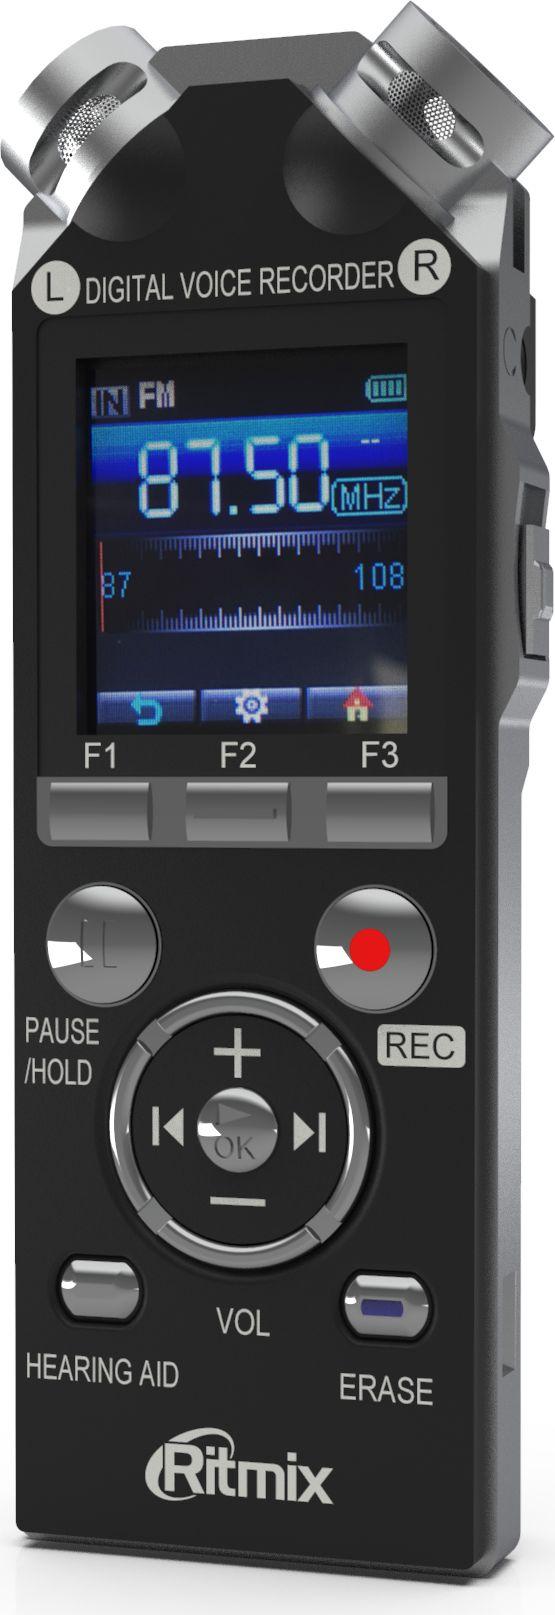 Ritmix RR-989 4GB, Black диктофон - MP3-плееры и диктофоны